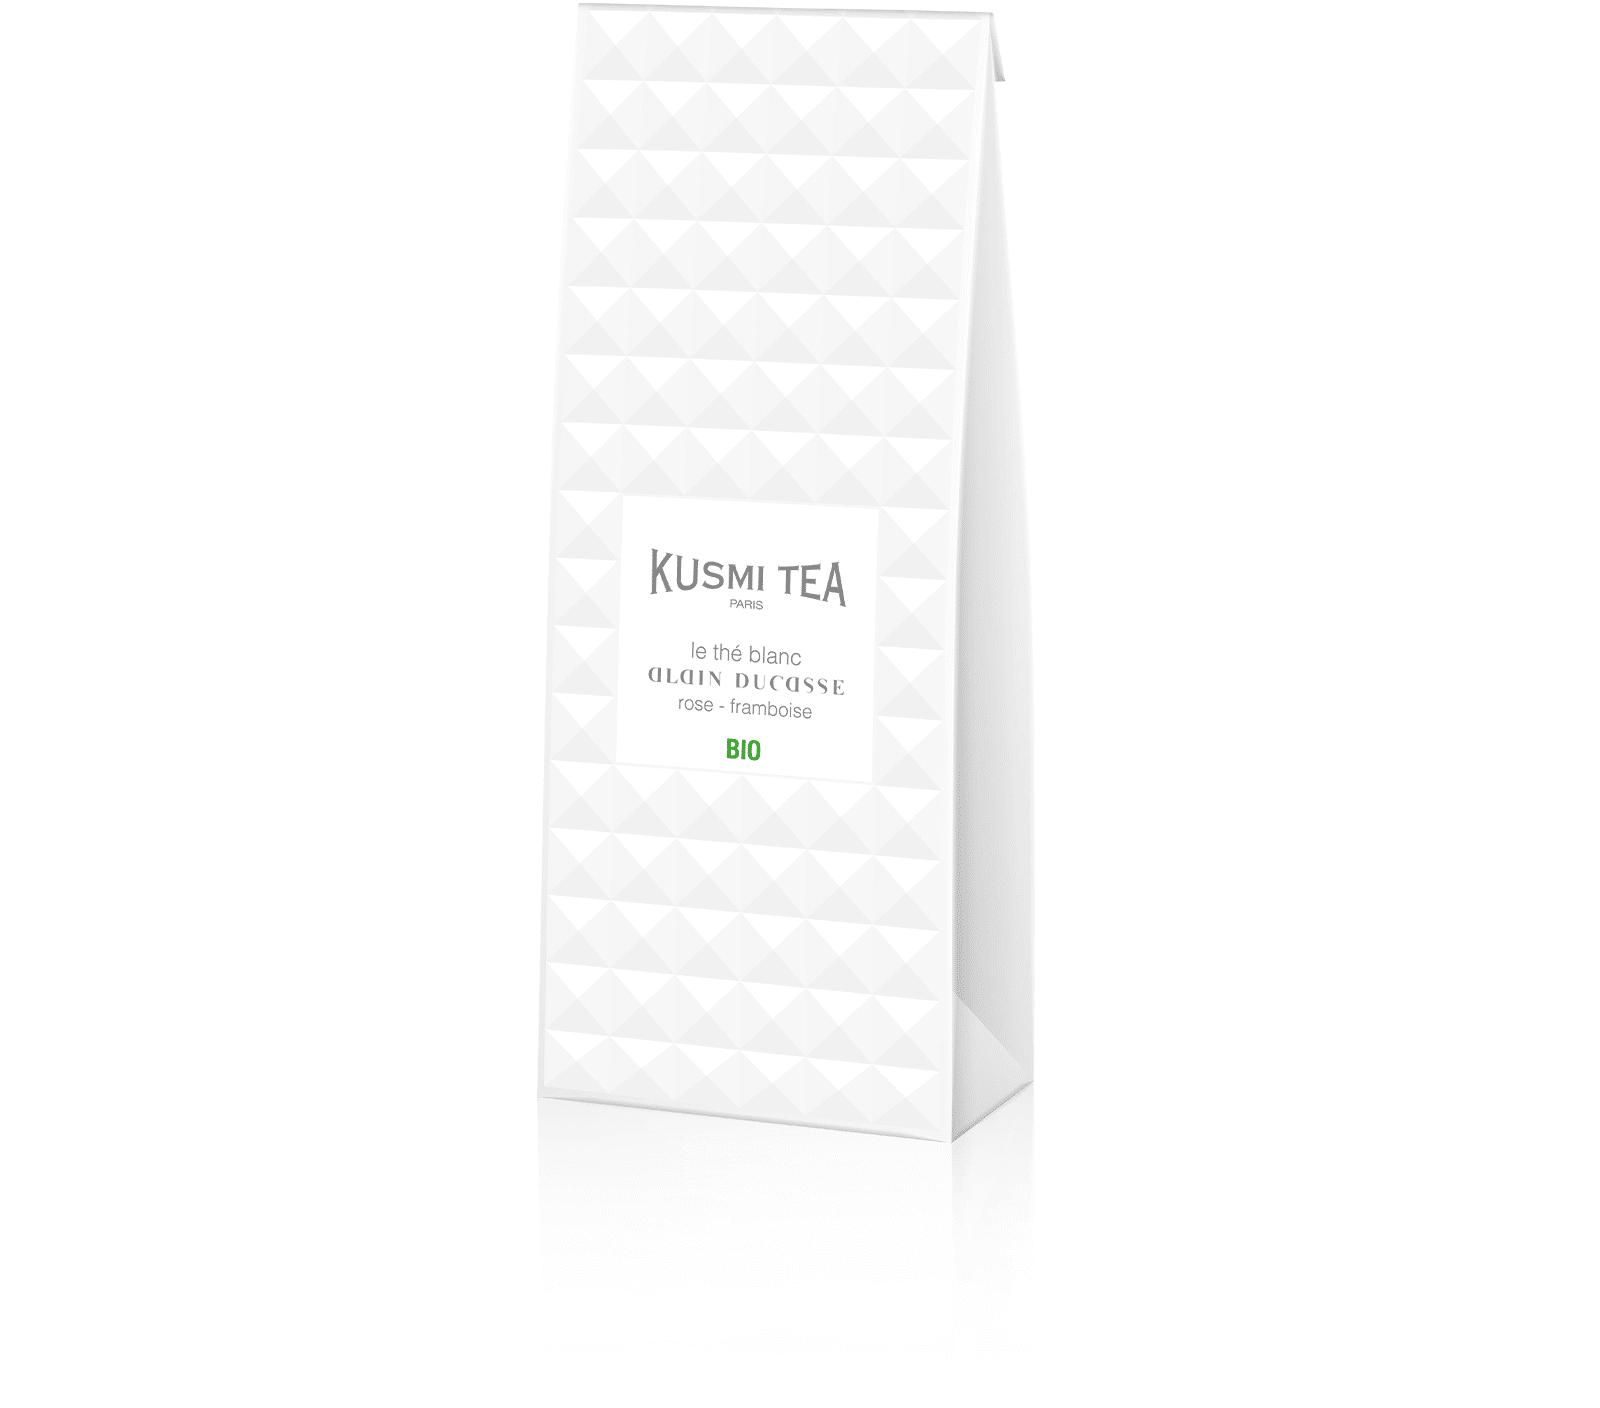 KUSMI TEA Le Thé Blanc Alain Ducasse Bio - Thé blanc aromatisé framboise et rose - Kusmi Tea